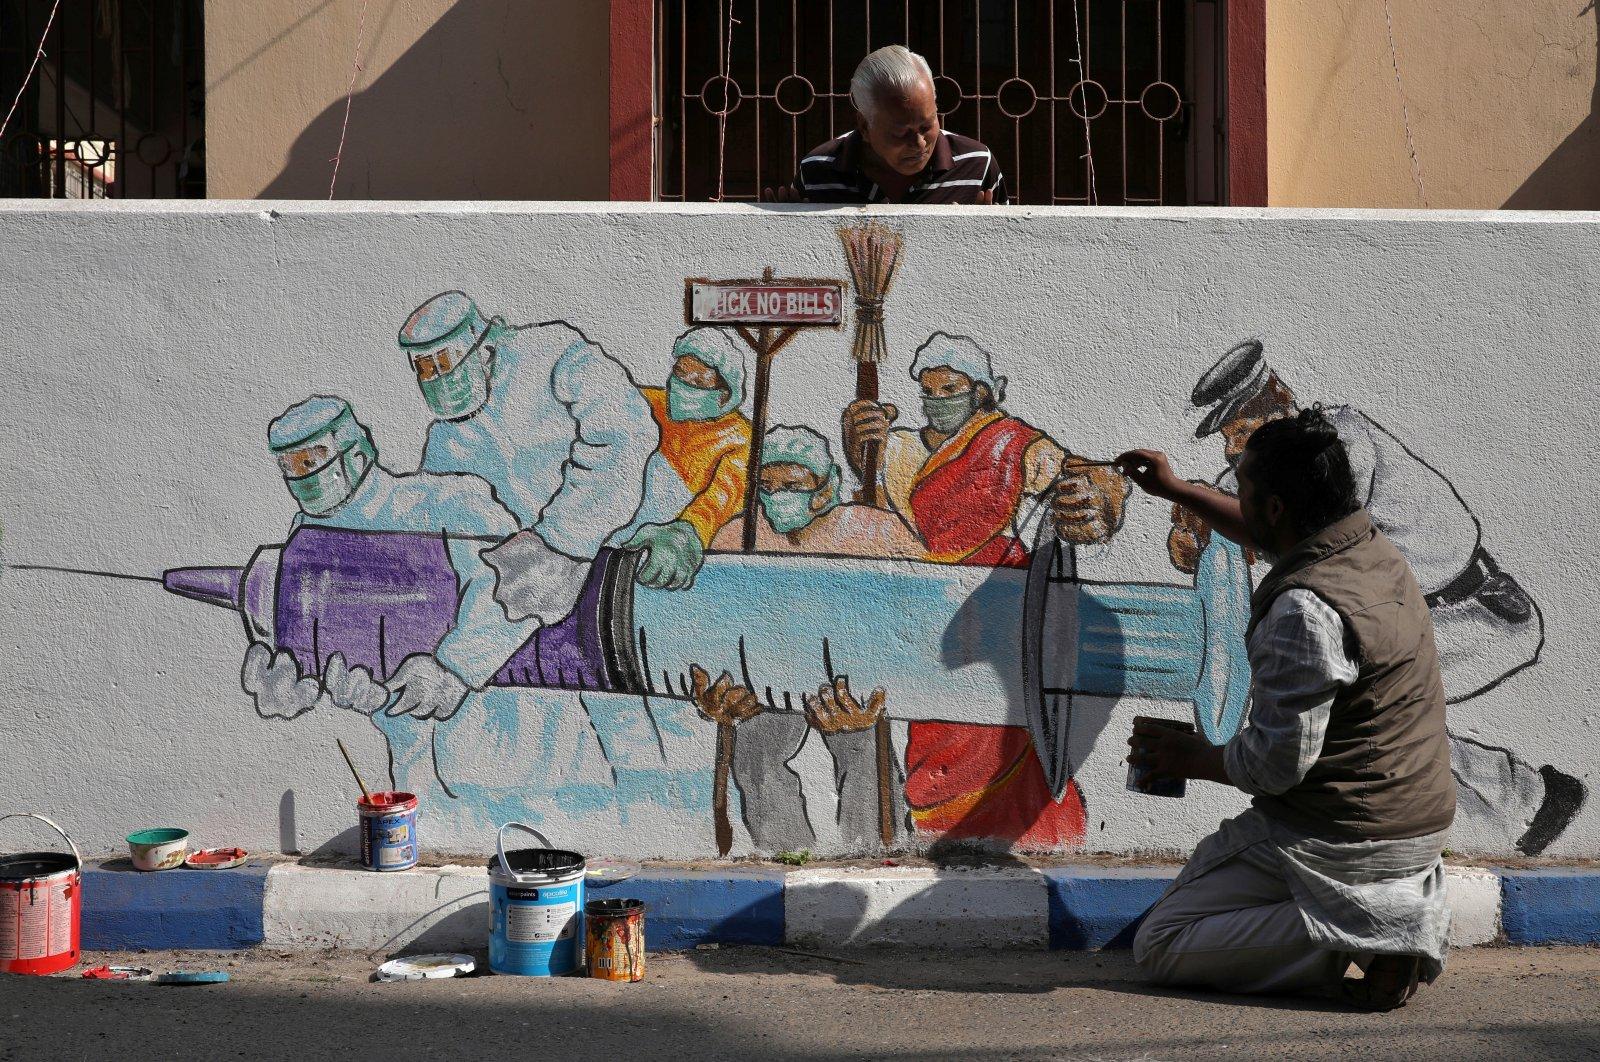 A man applies finishing touches to graffiti representing a vaccine, amidst the spread of coronavirus disease (COVID-19) in Kolkata, India, Jan. 2, 2021. (Reuters Photo)